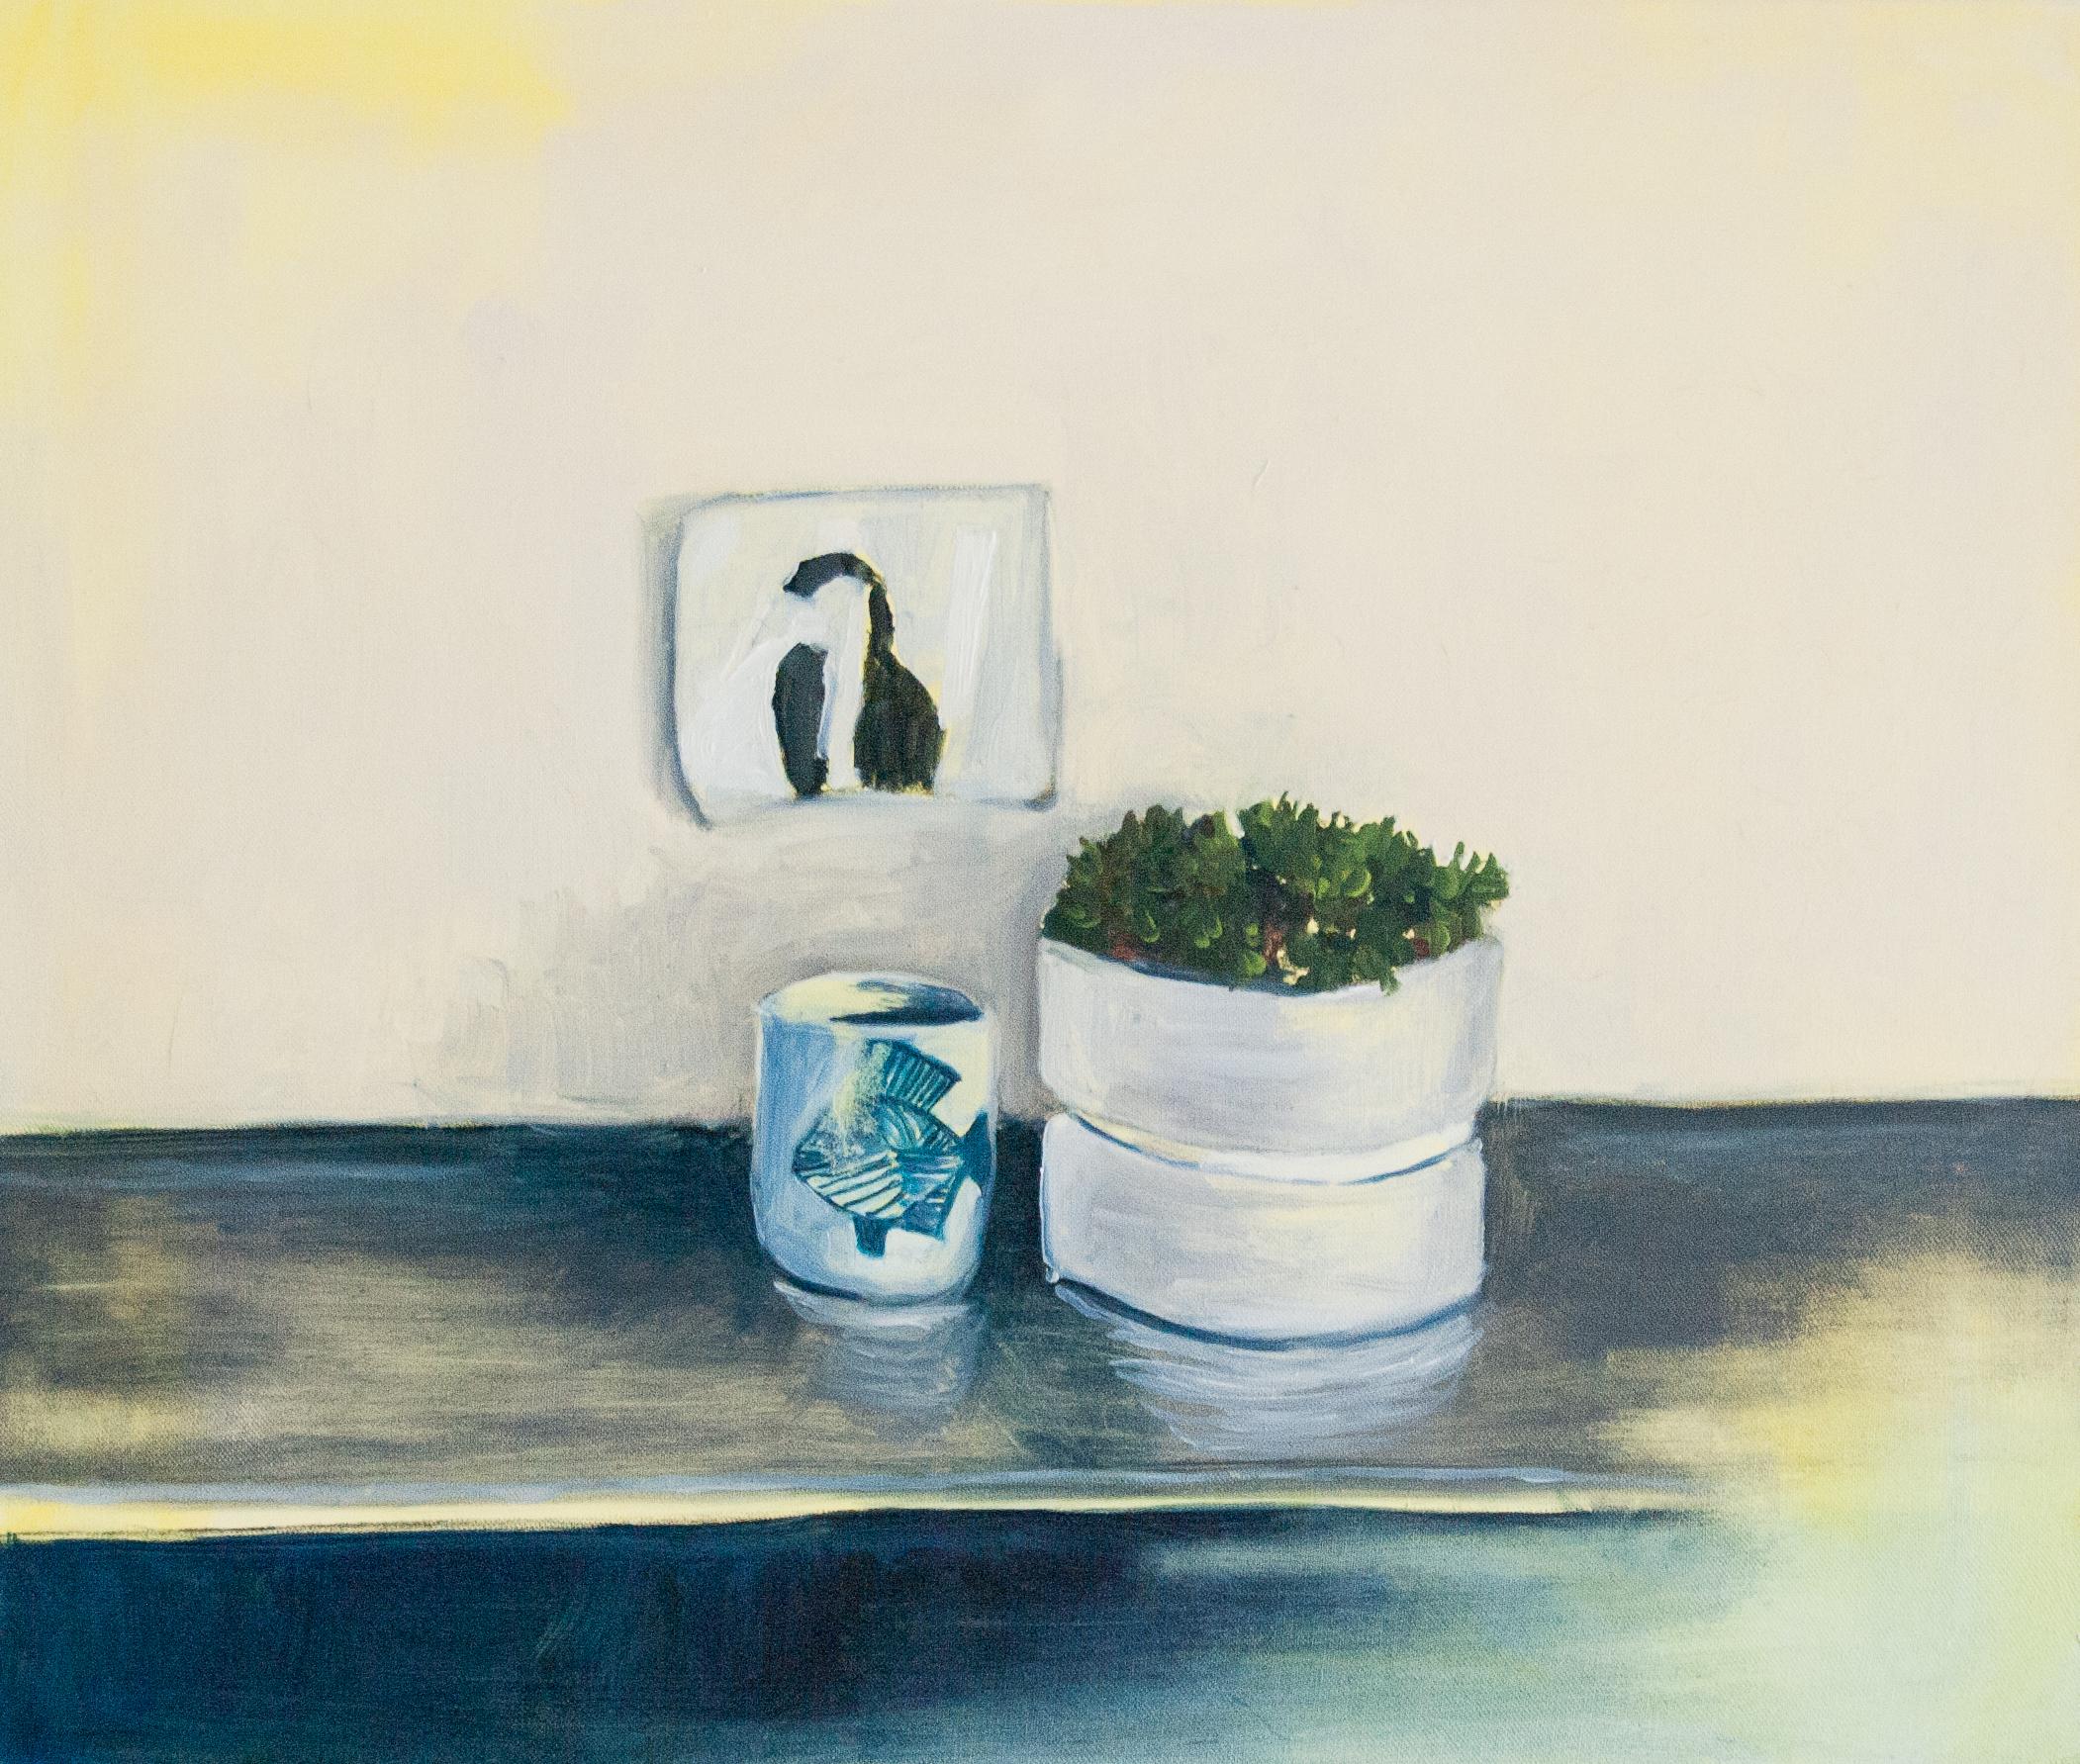 Still Life Day 233. 60x50cm. Oil on canvas. 2016.